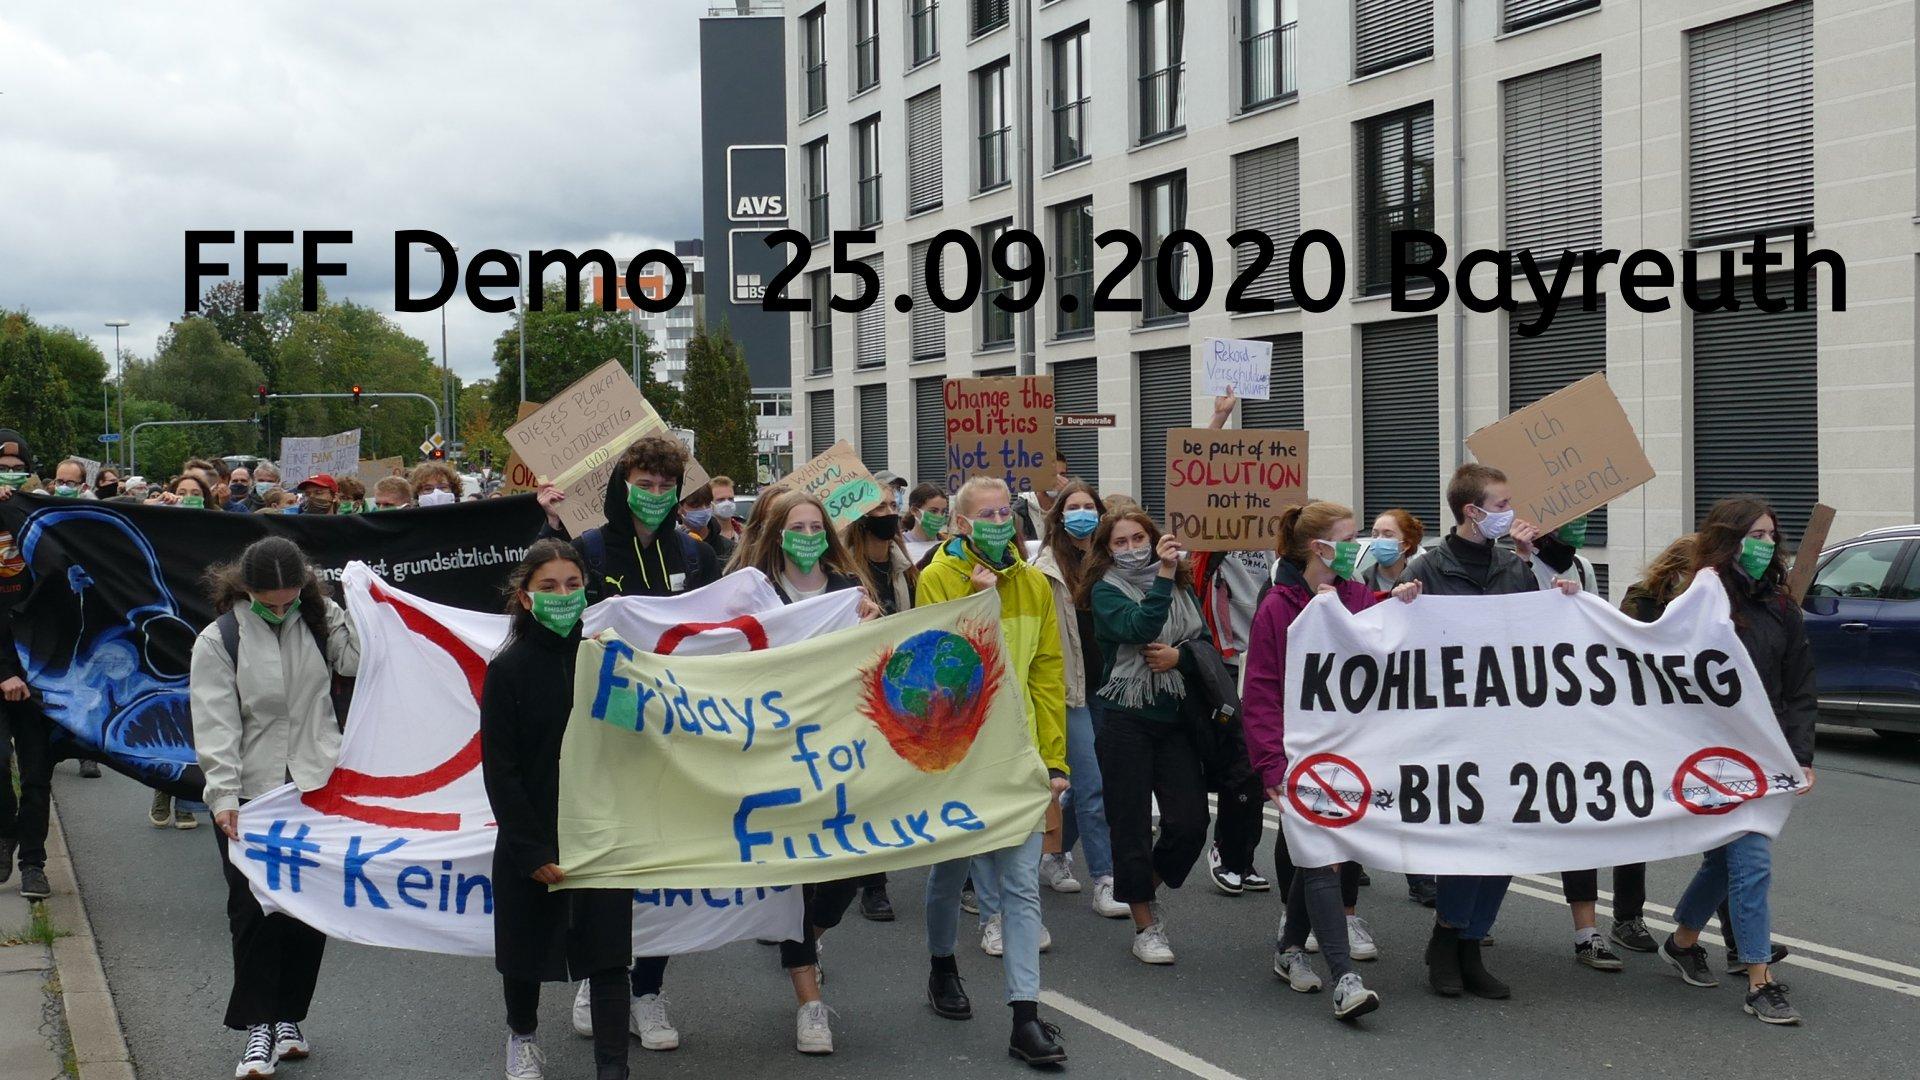 Fridays for Future 25.09.20 | My RØDE Reel 2020